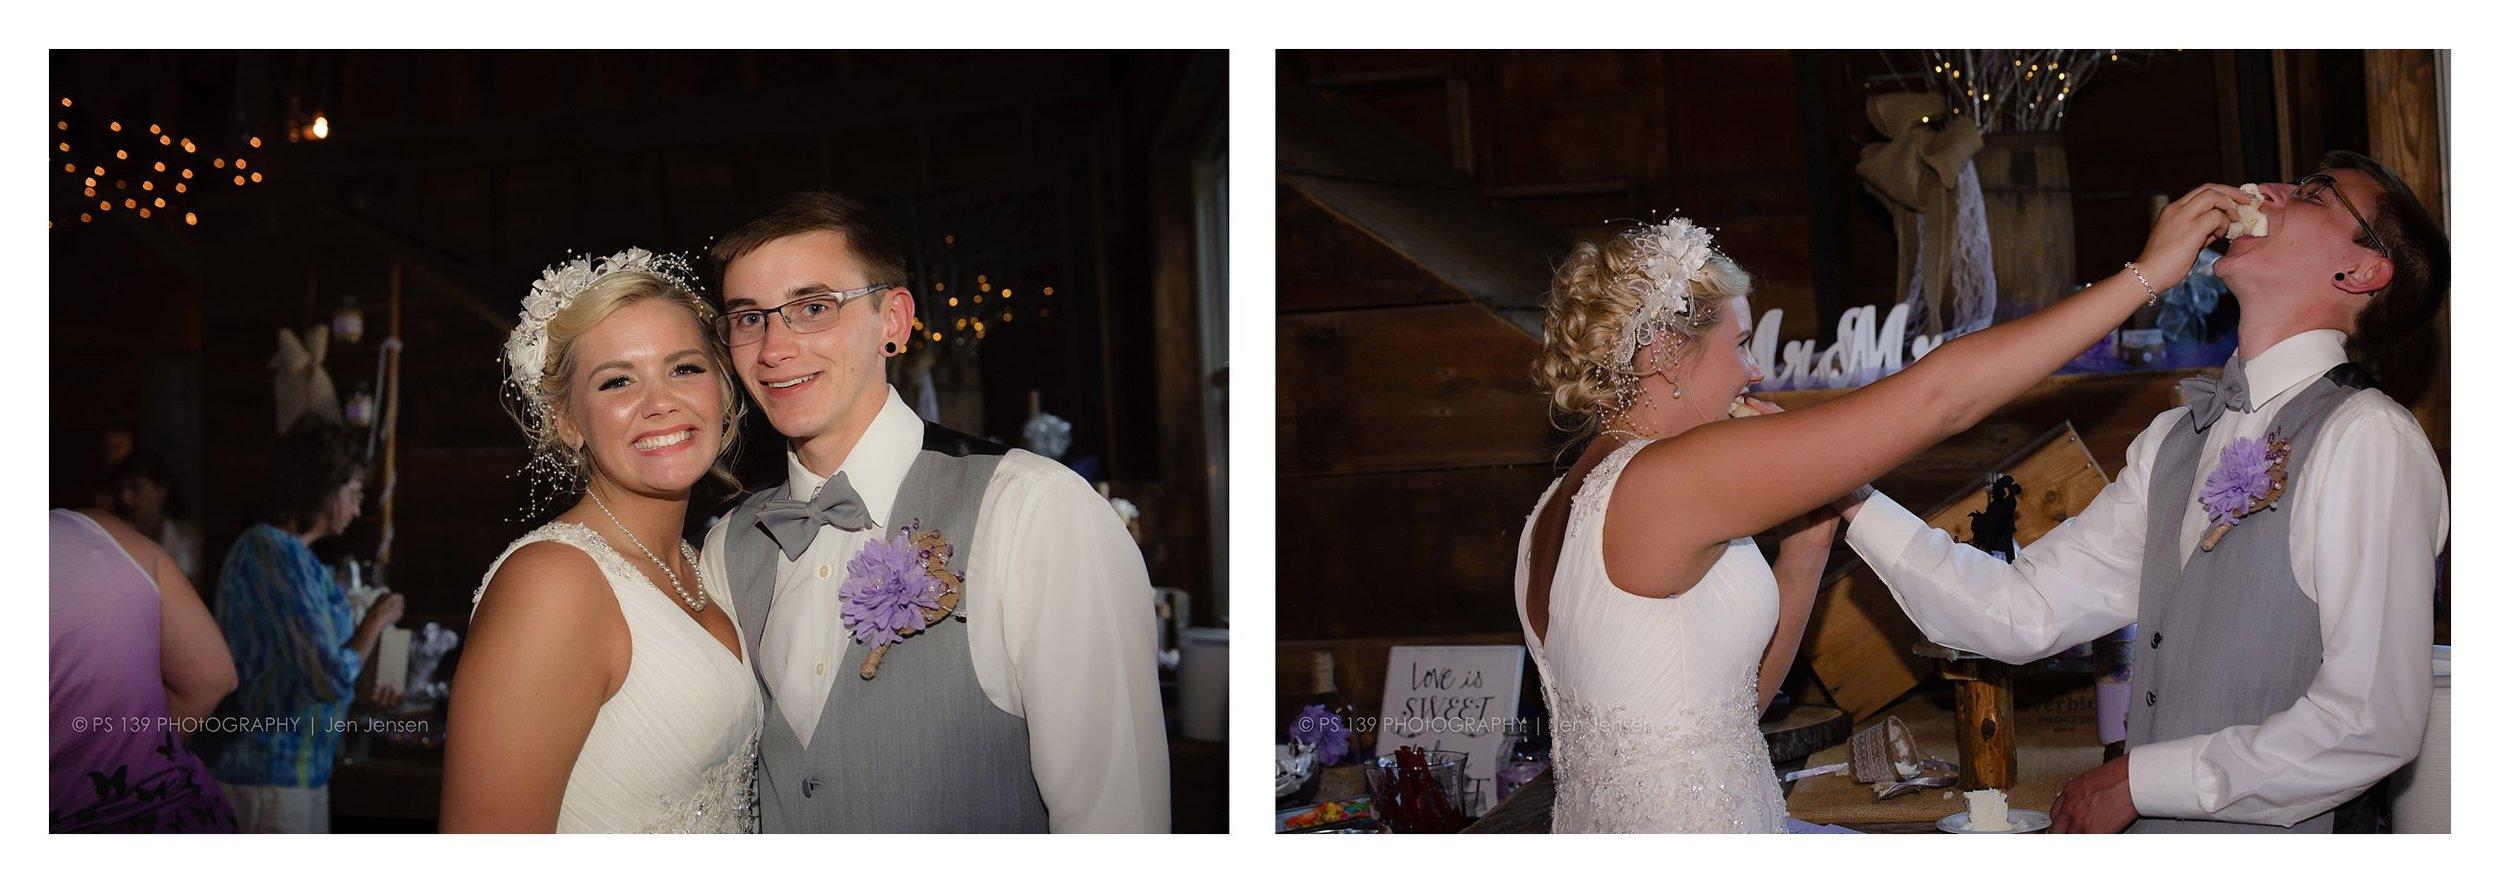 oregon Illinois oak lane farm wisconsin wedding photographer bayfield wi ps 139 photography jen jensen_0248.jpg